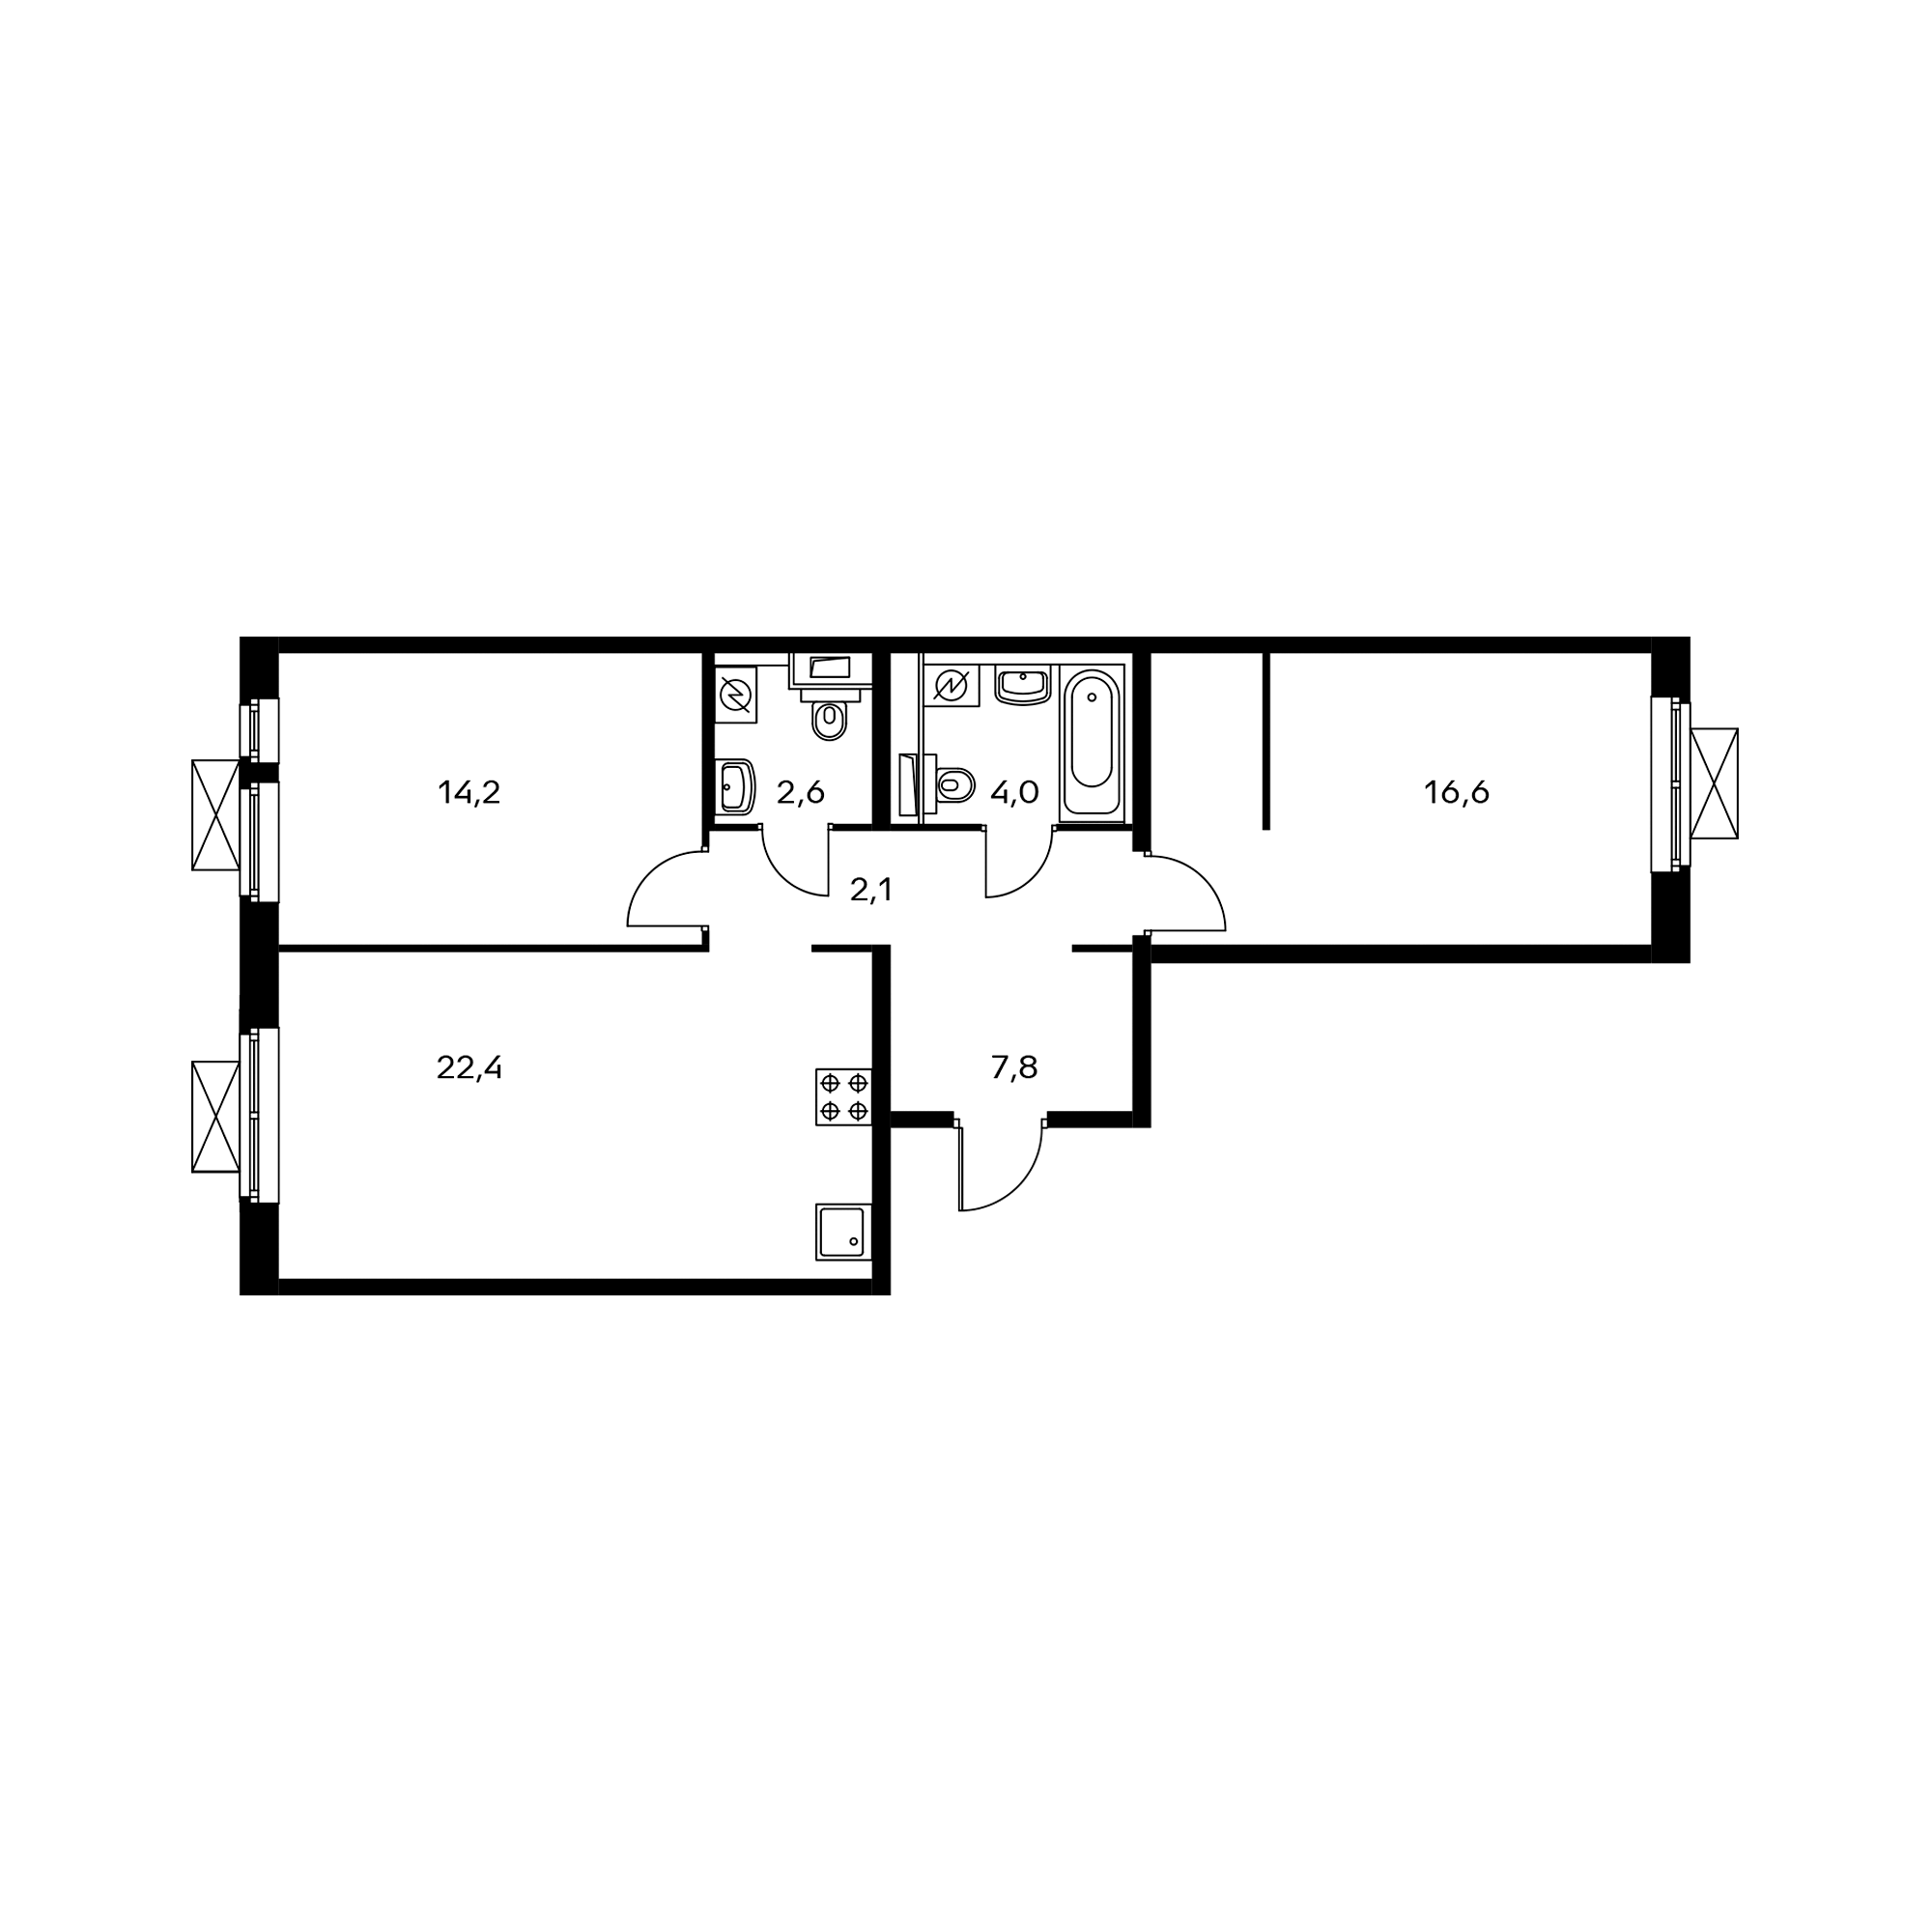 2EL10_6.9-2